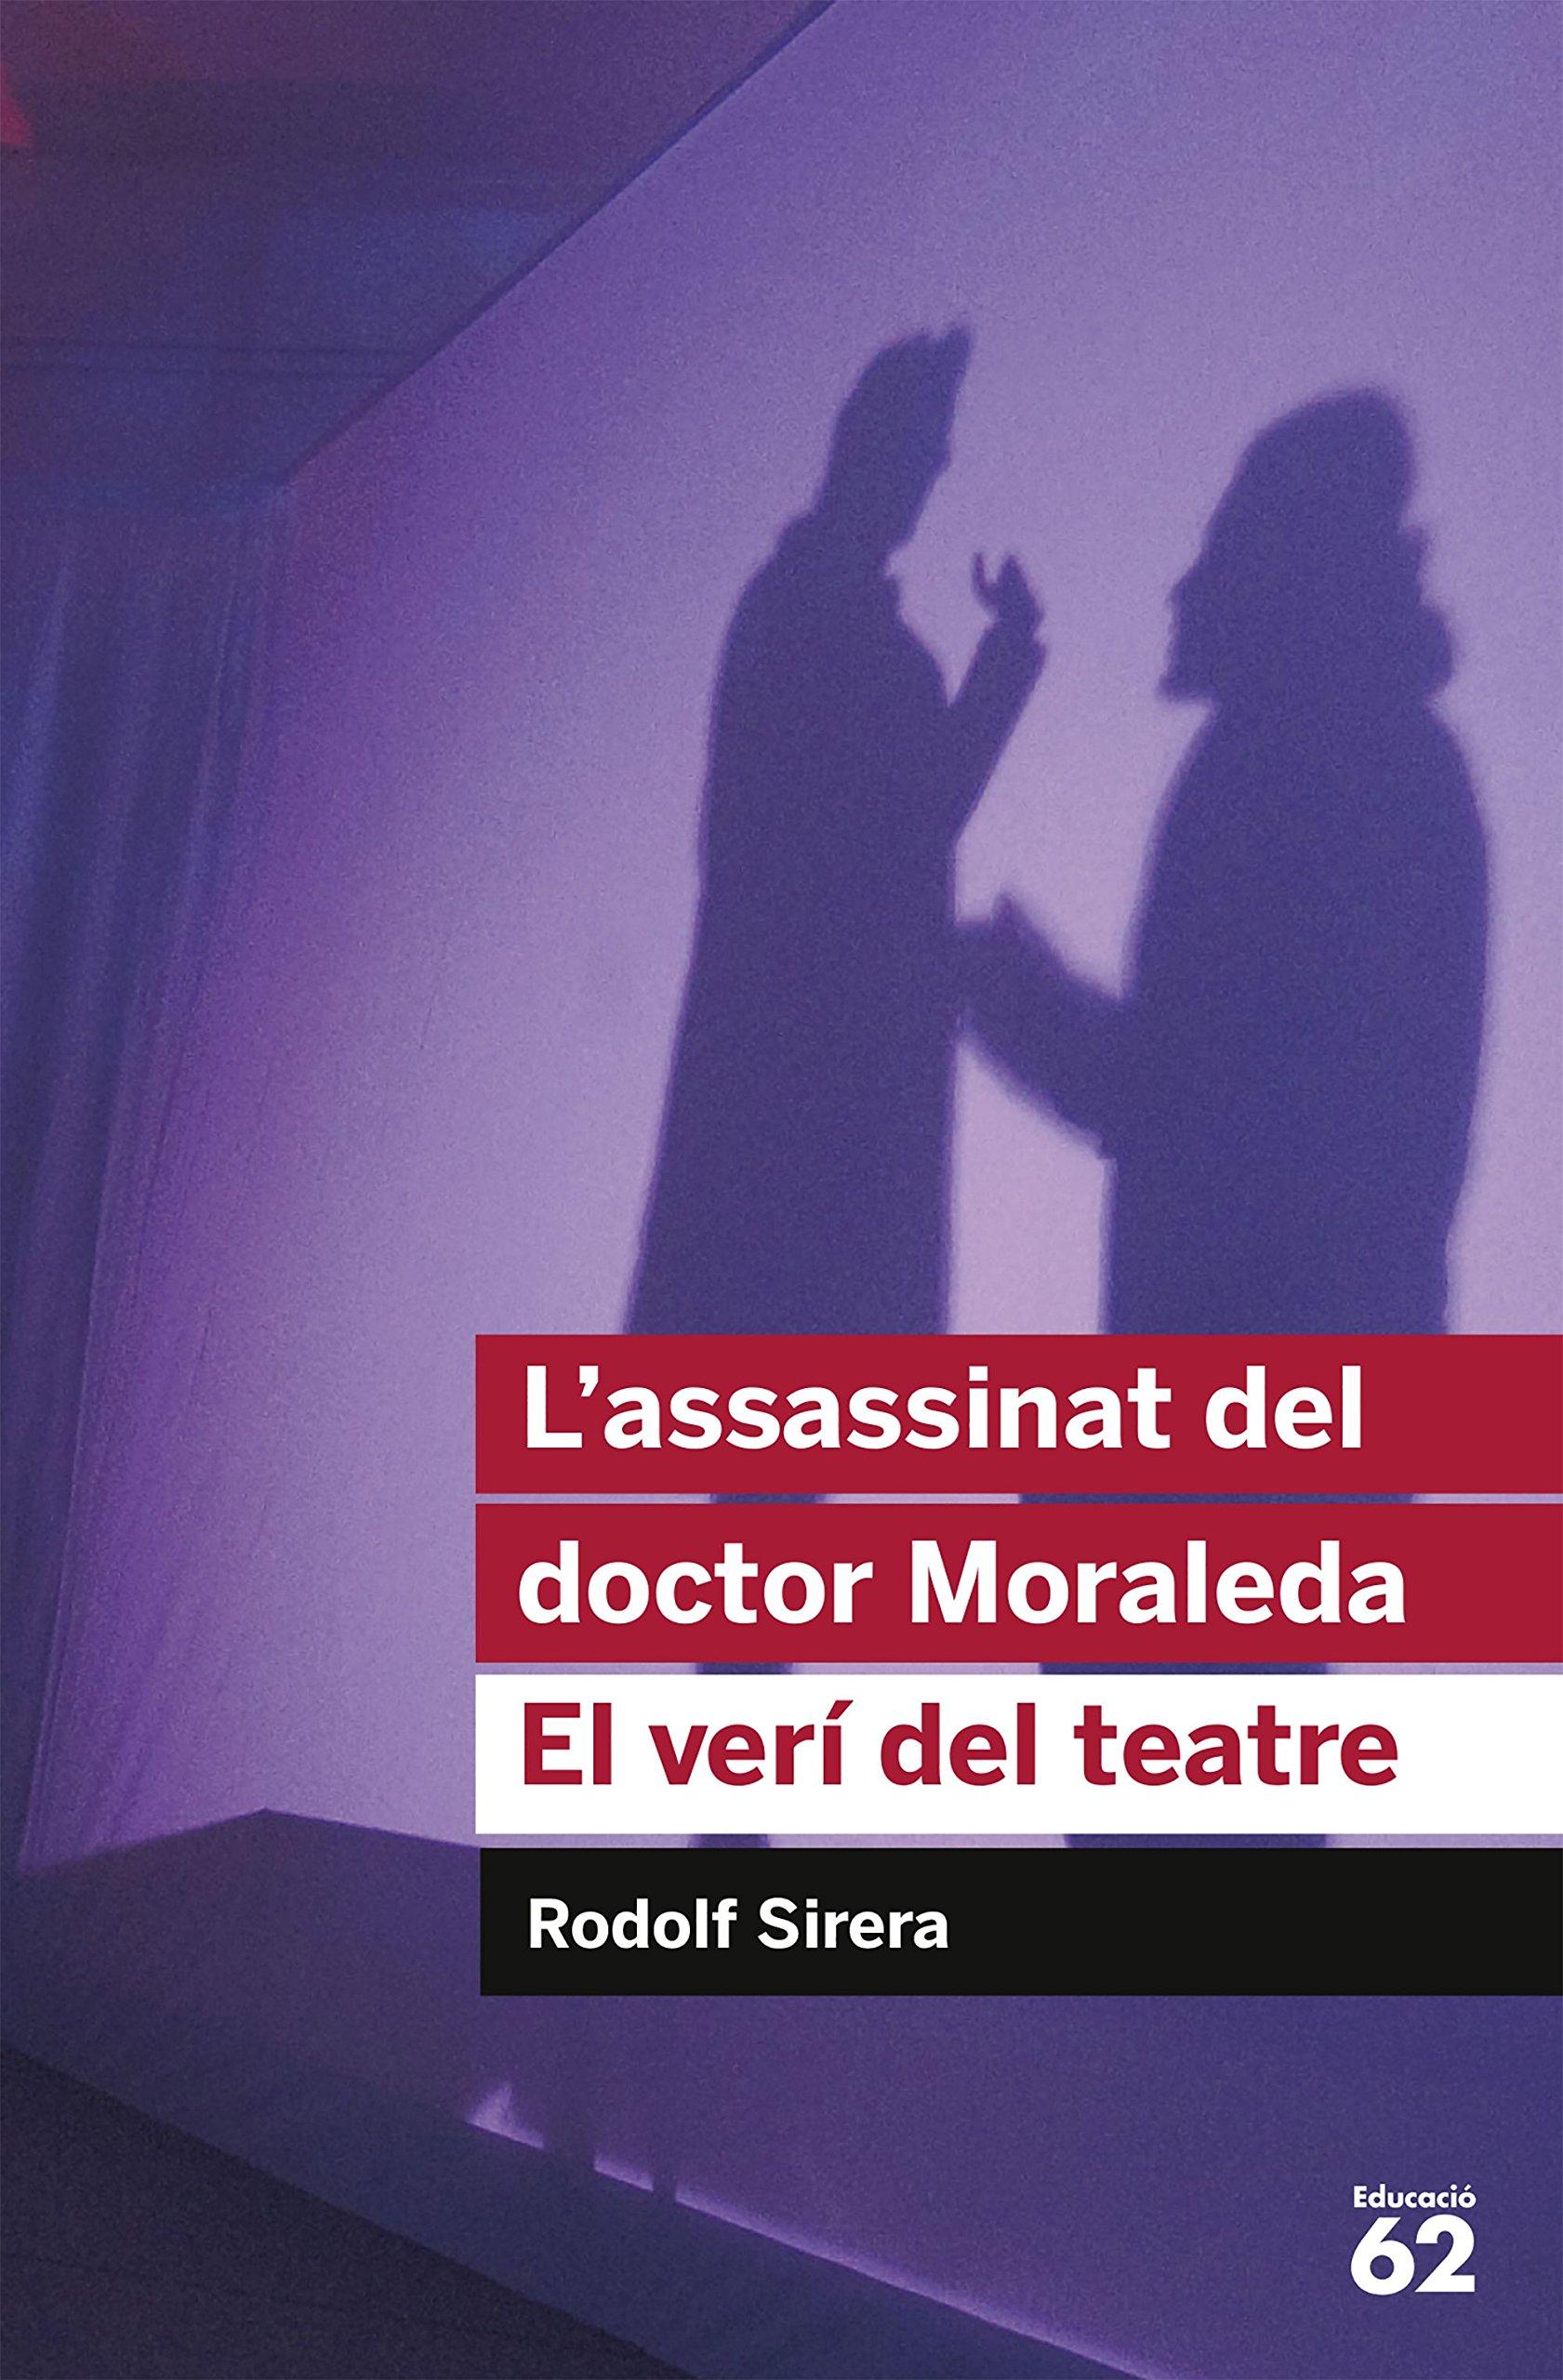 Lassassinat Del Doctor Moraleda. El Verí Del Teatre - Reedició Educació 62: Amazon.es: Sirera Turó, Rodolf: Libros